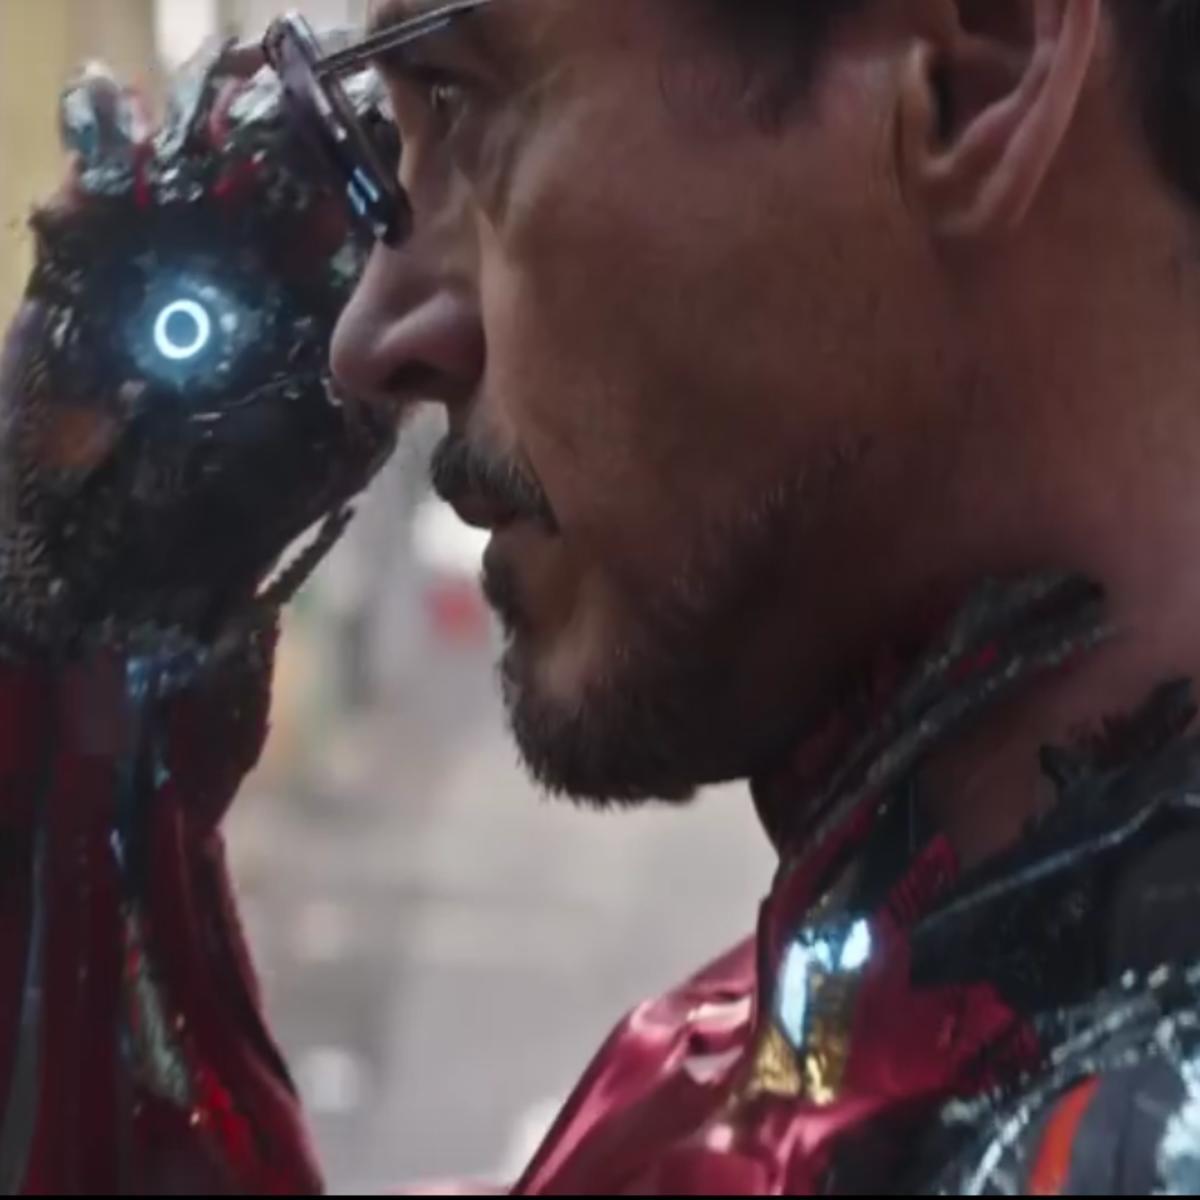 tony_stark_infinity_war_trailer.png